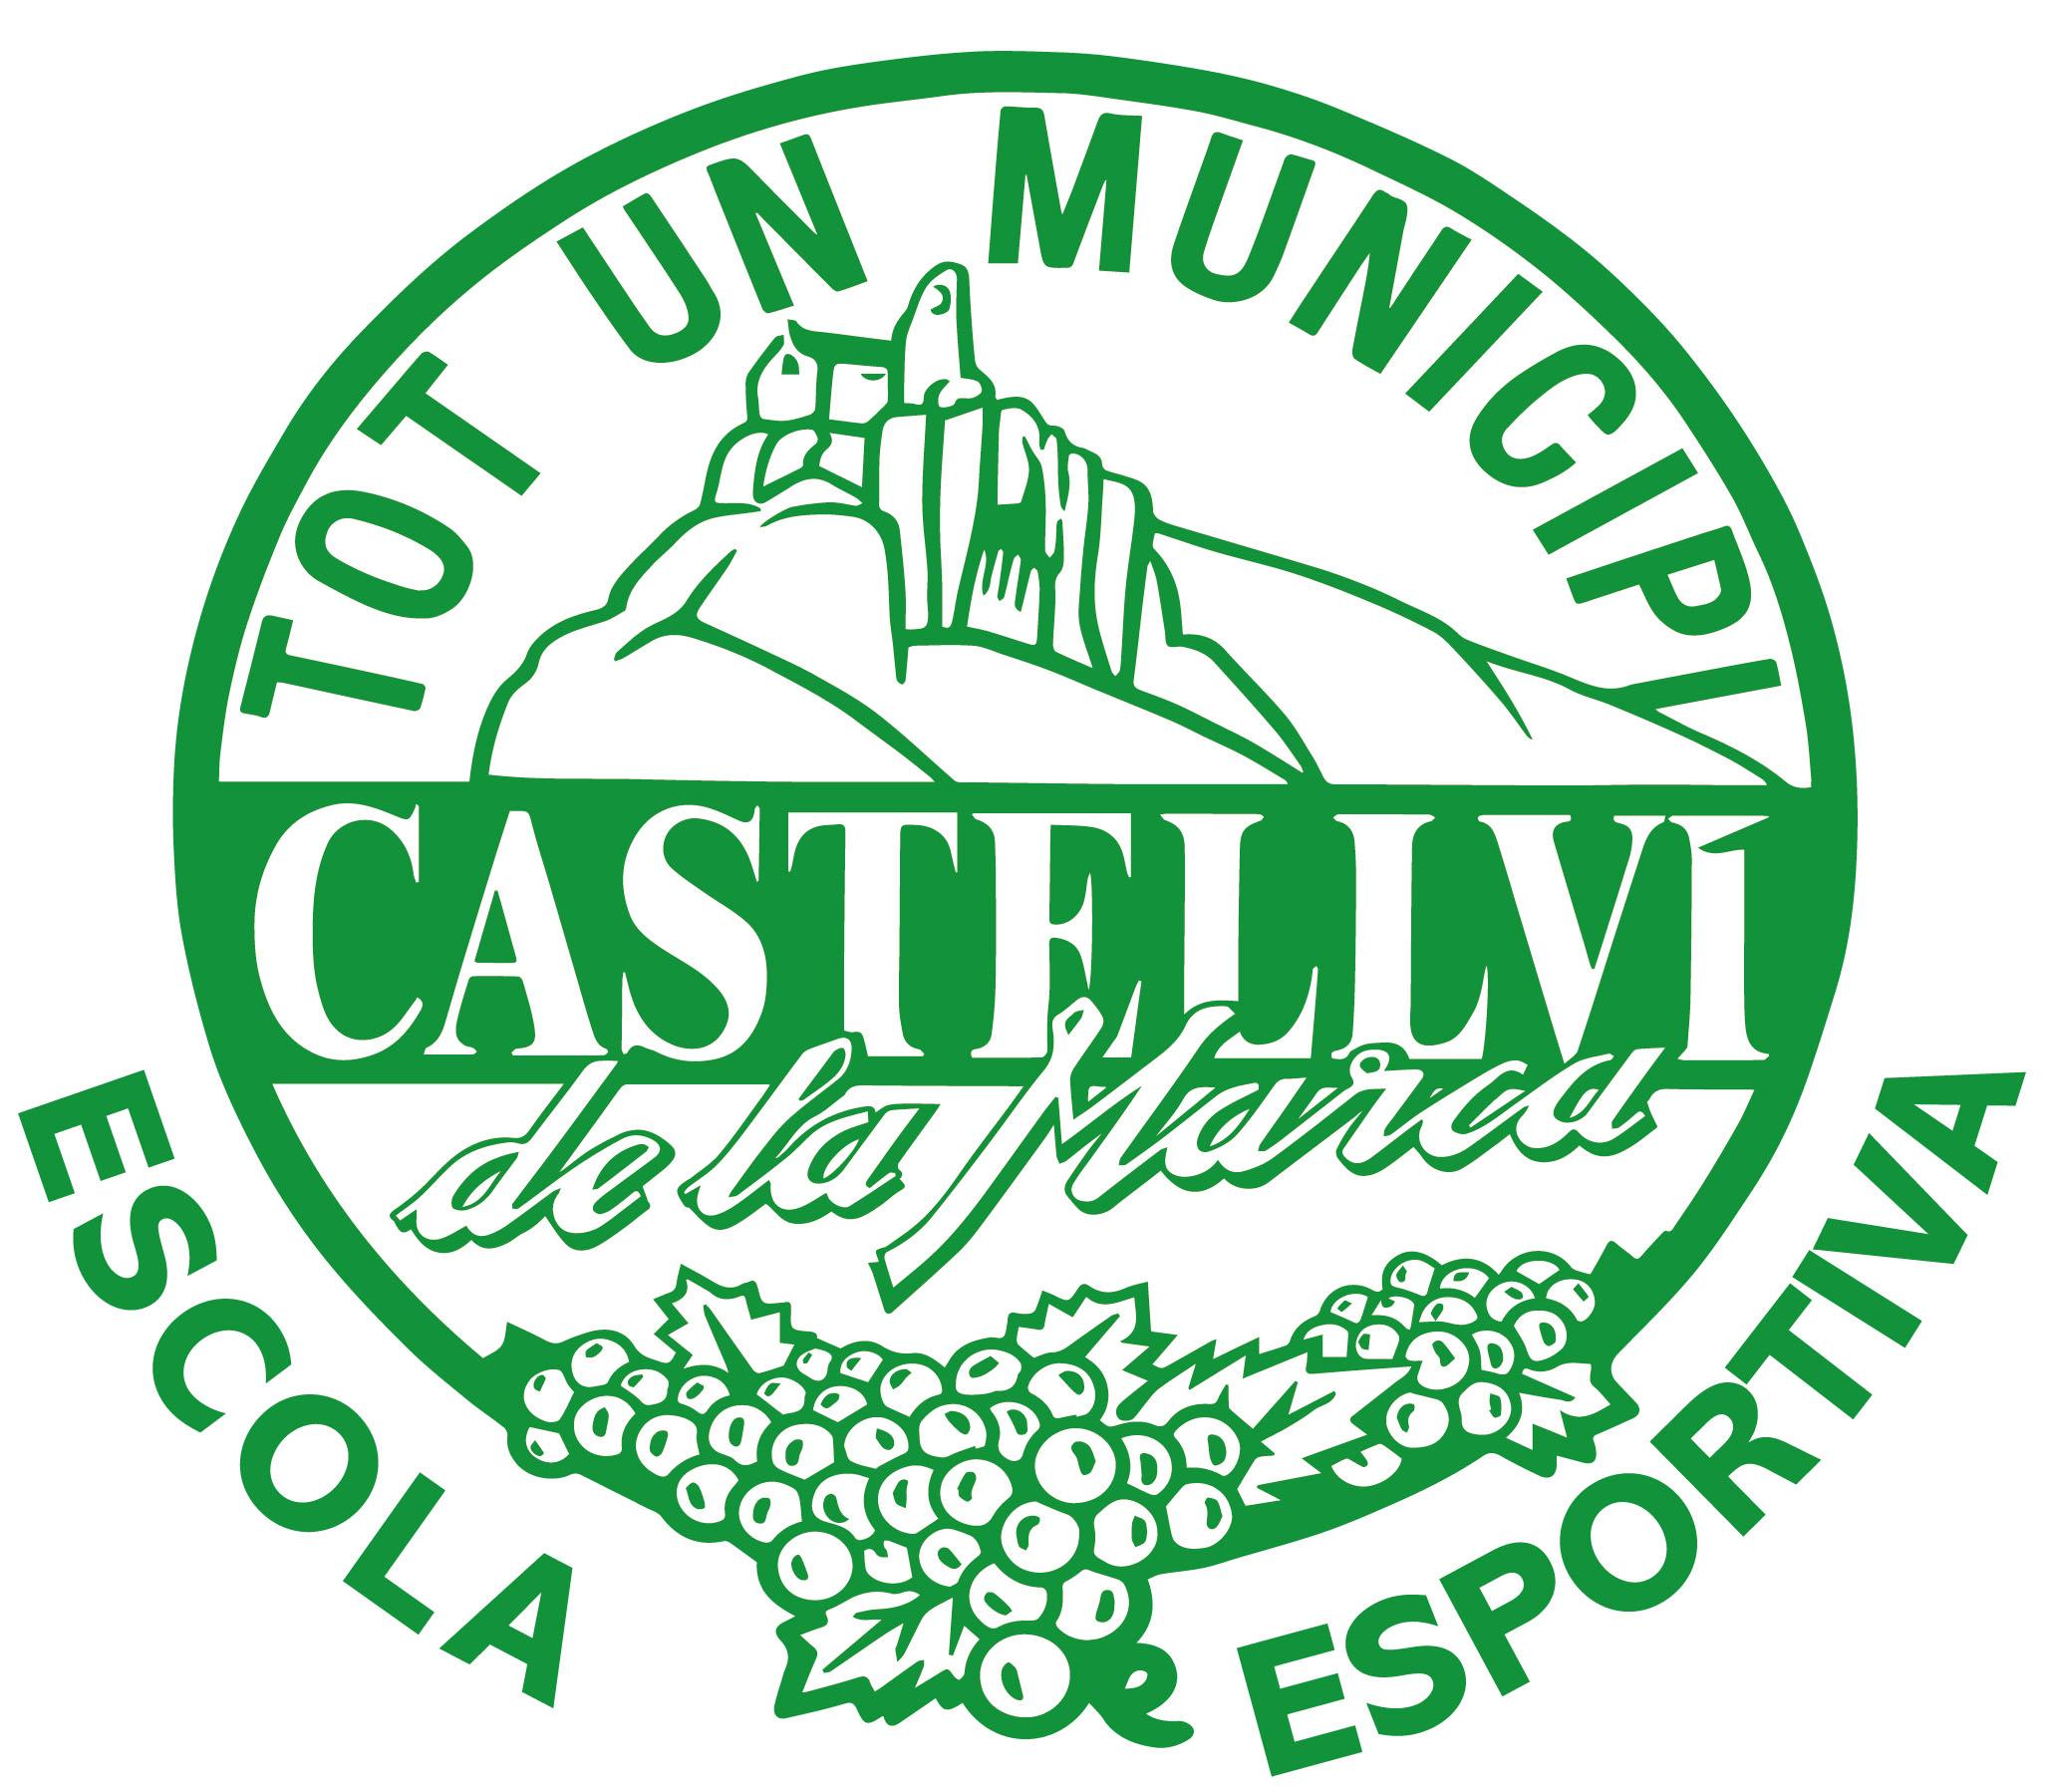 CLUB FUTBOL CASTELLVI DE LA MARCA